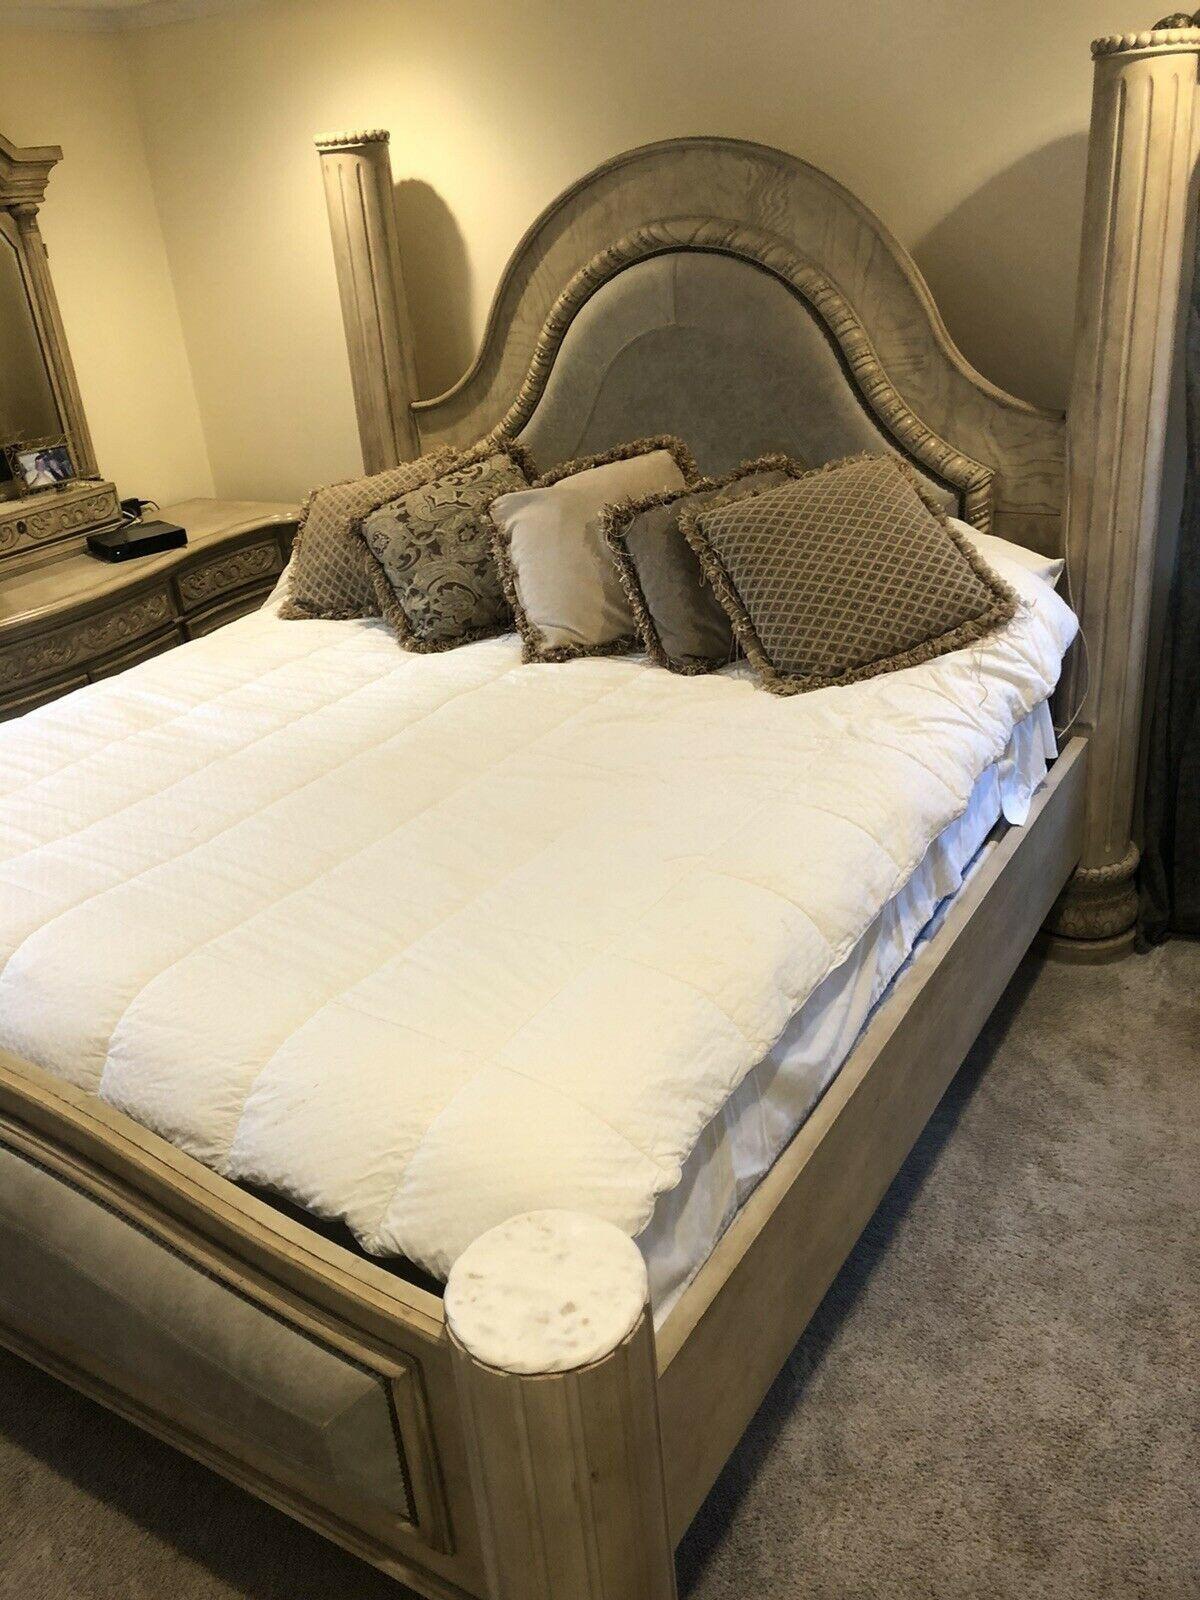 Used King Bedroom Set 6 Piece Marble Top King Italian Bedroom Set King Bedroom Sets King Bedroom King Size Bedroom Furniture Sets